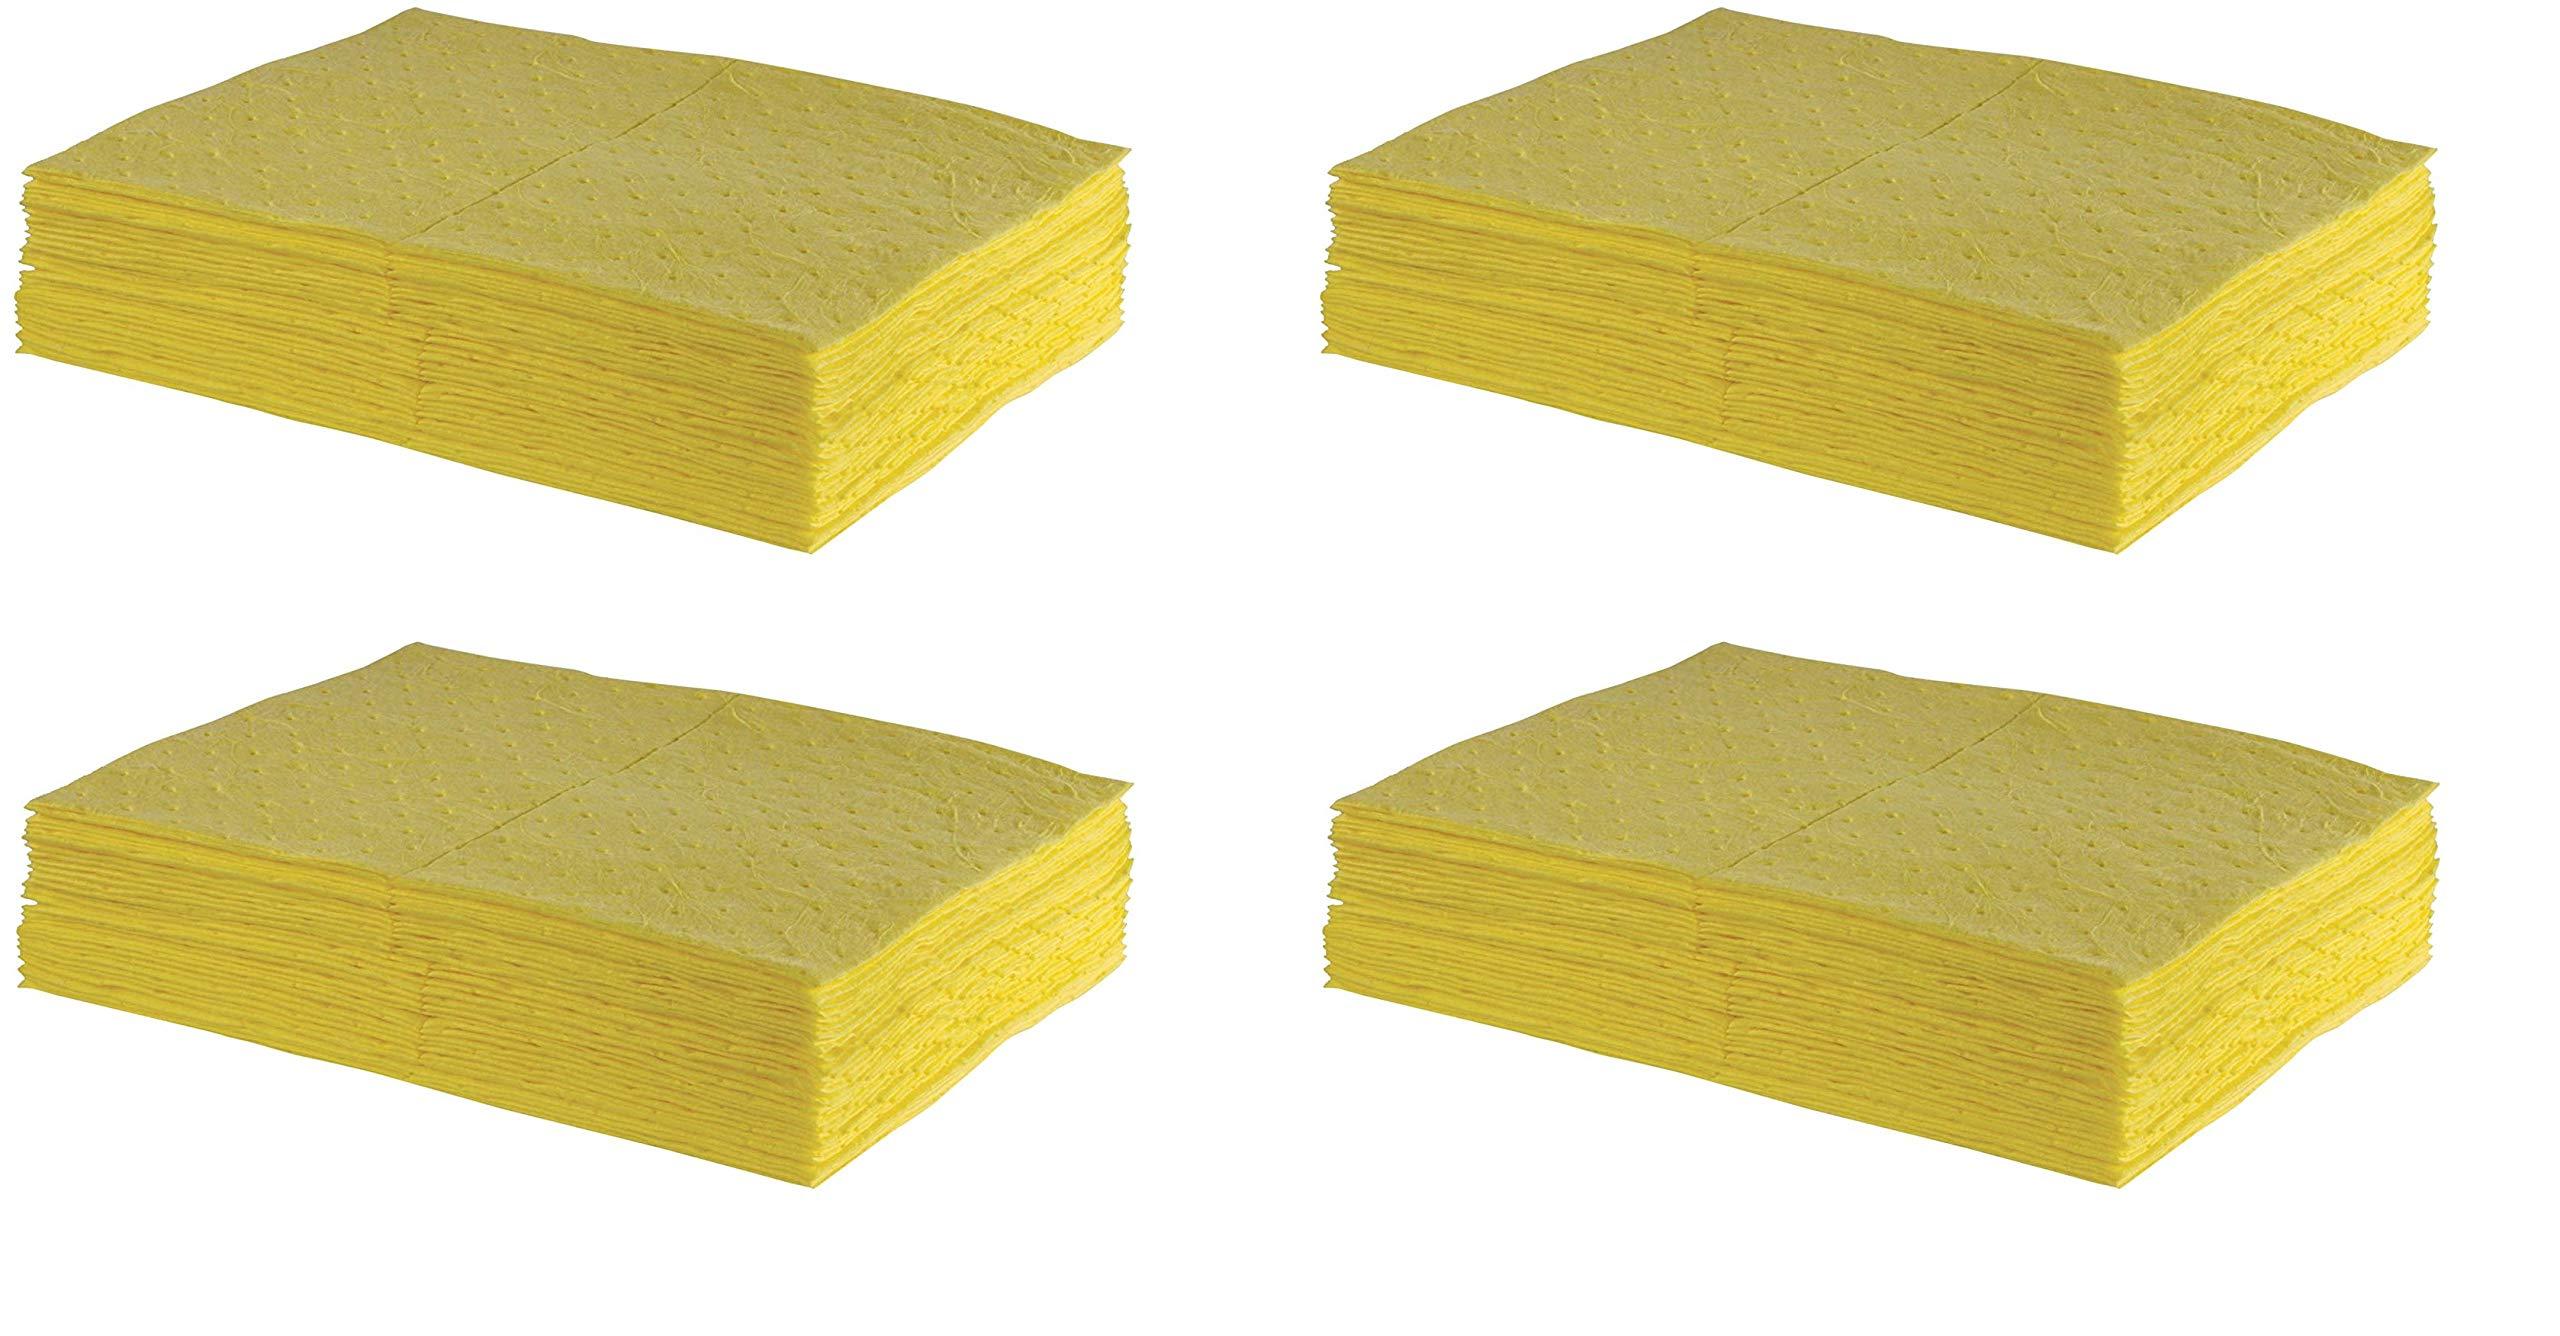 ESP 2MBYPB Polypropylene Medium Weight Meltblown Absorbent Sonic Bonded Hazmat Pad, 20 Gallons Oil and 13 Gallons Water Absorbency, 18'' Length X 15'' Width, Yellow (100 per Bale) (4 X 100 per Bale)